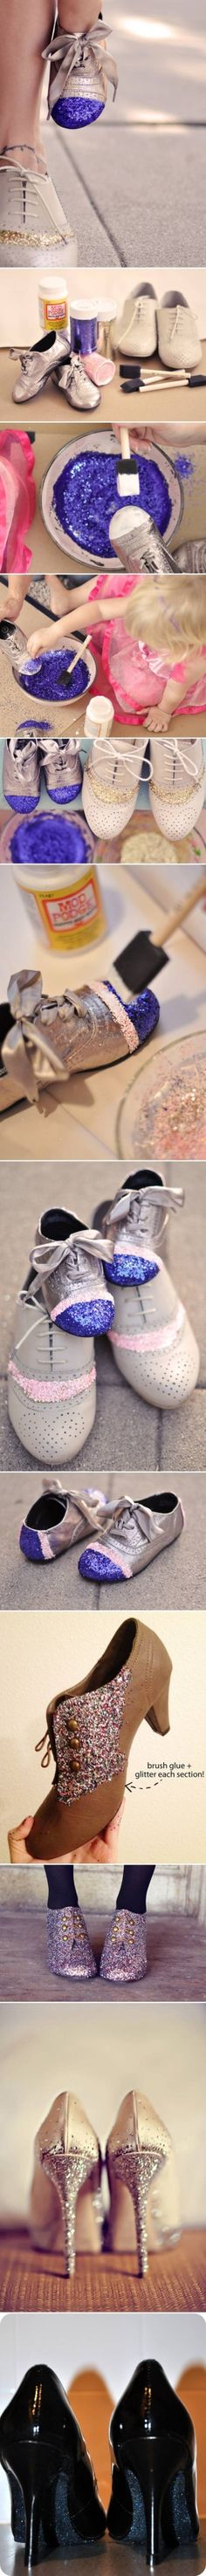 DIY Easy Glitter Shoes DIY Easy Glitter Shoes by diyforever